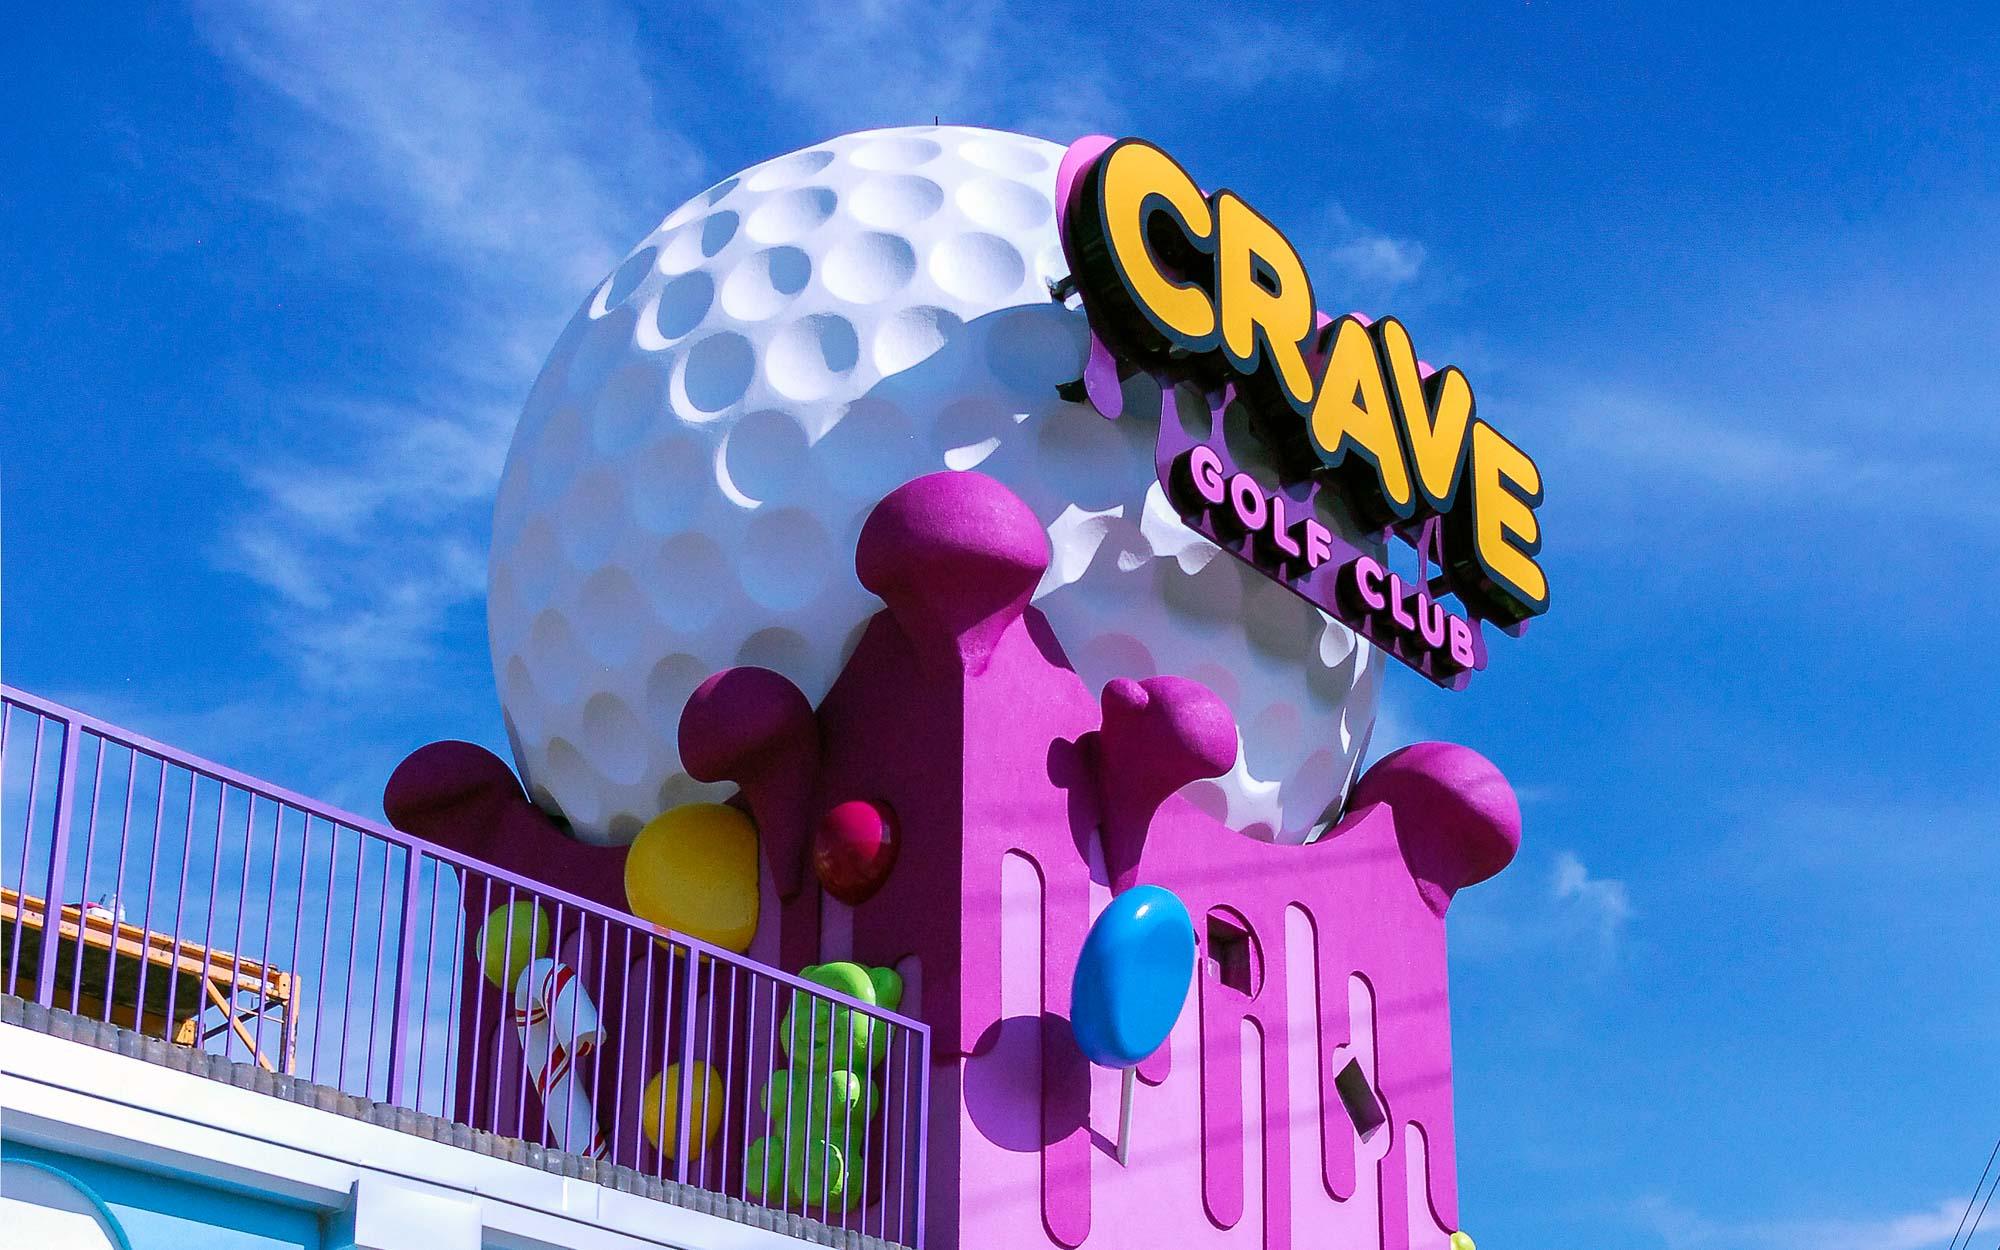 Display Dynamics - Crave golf club